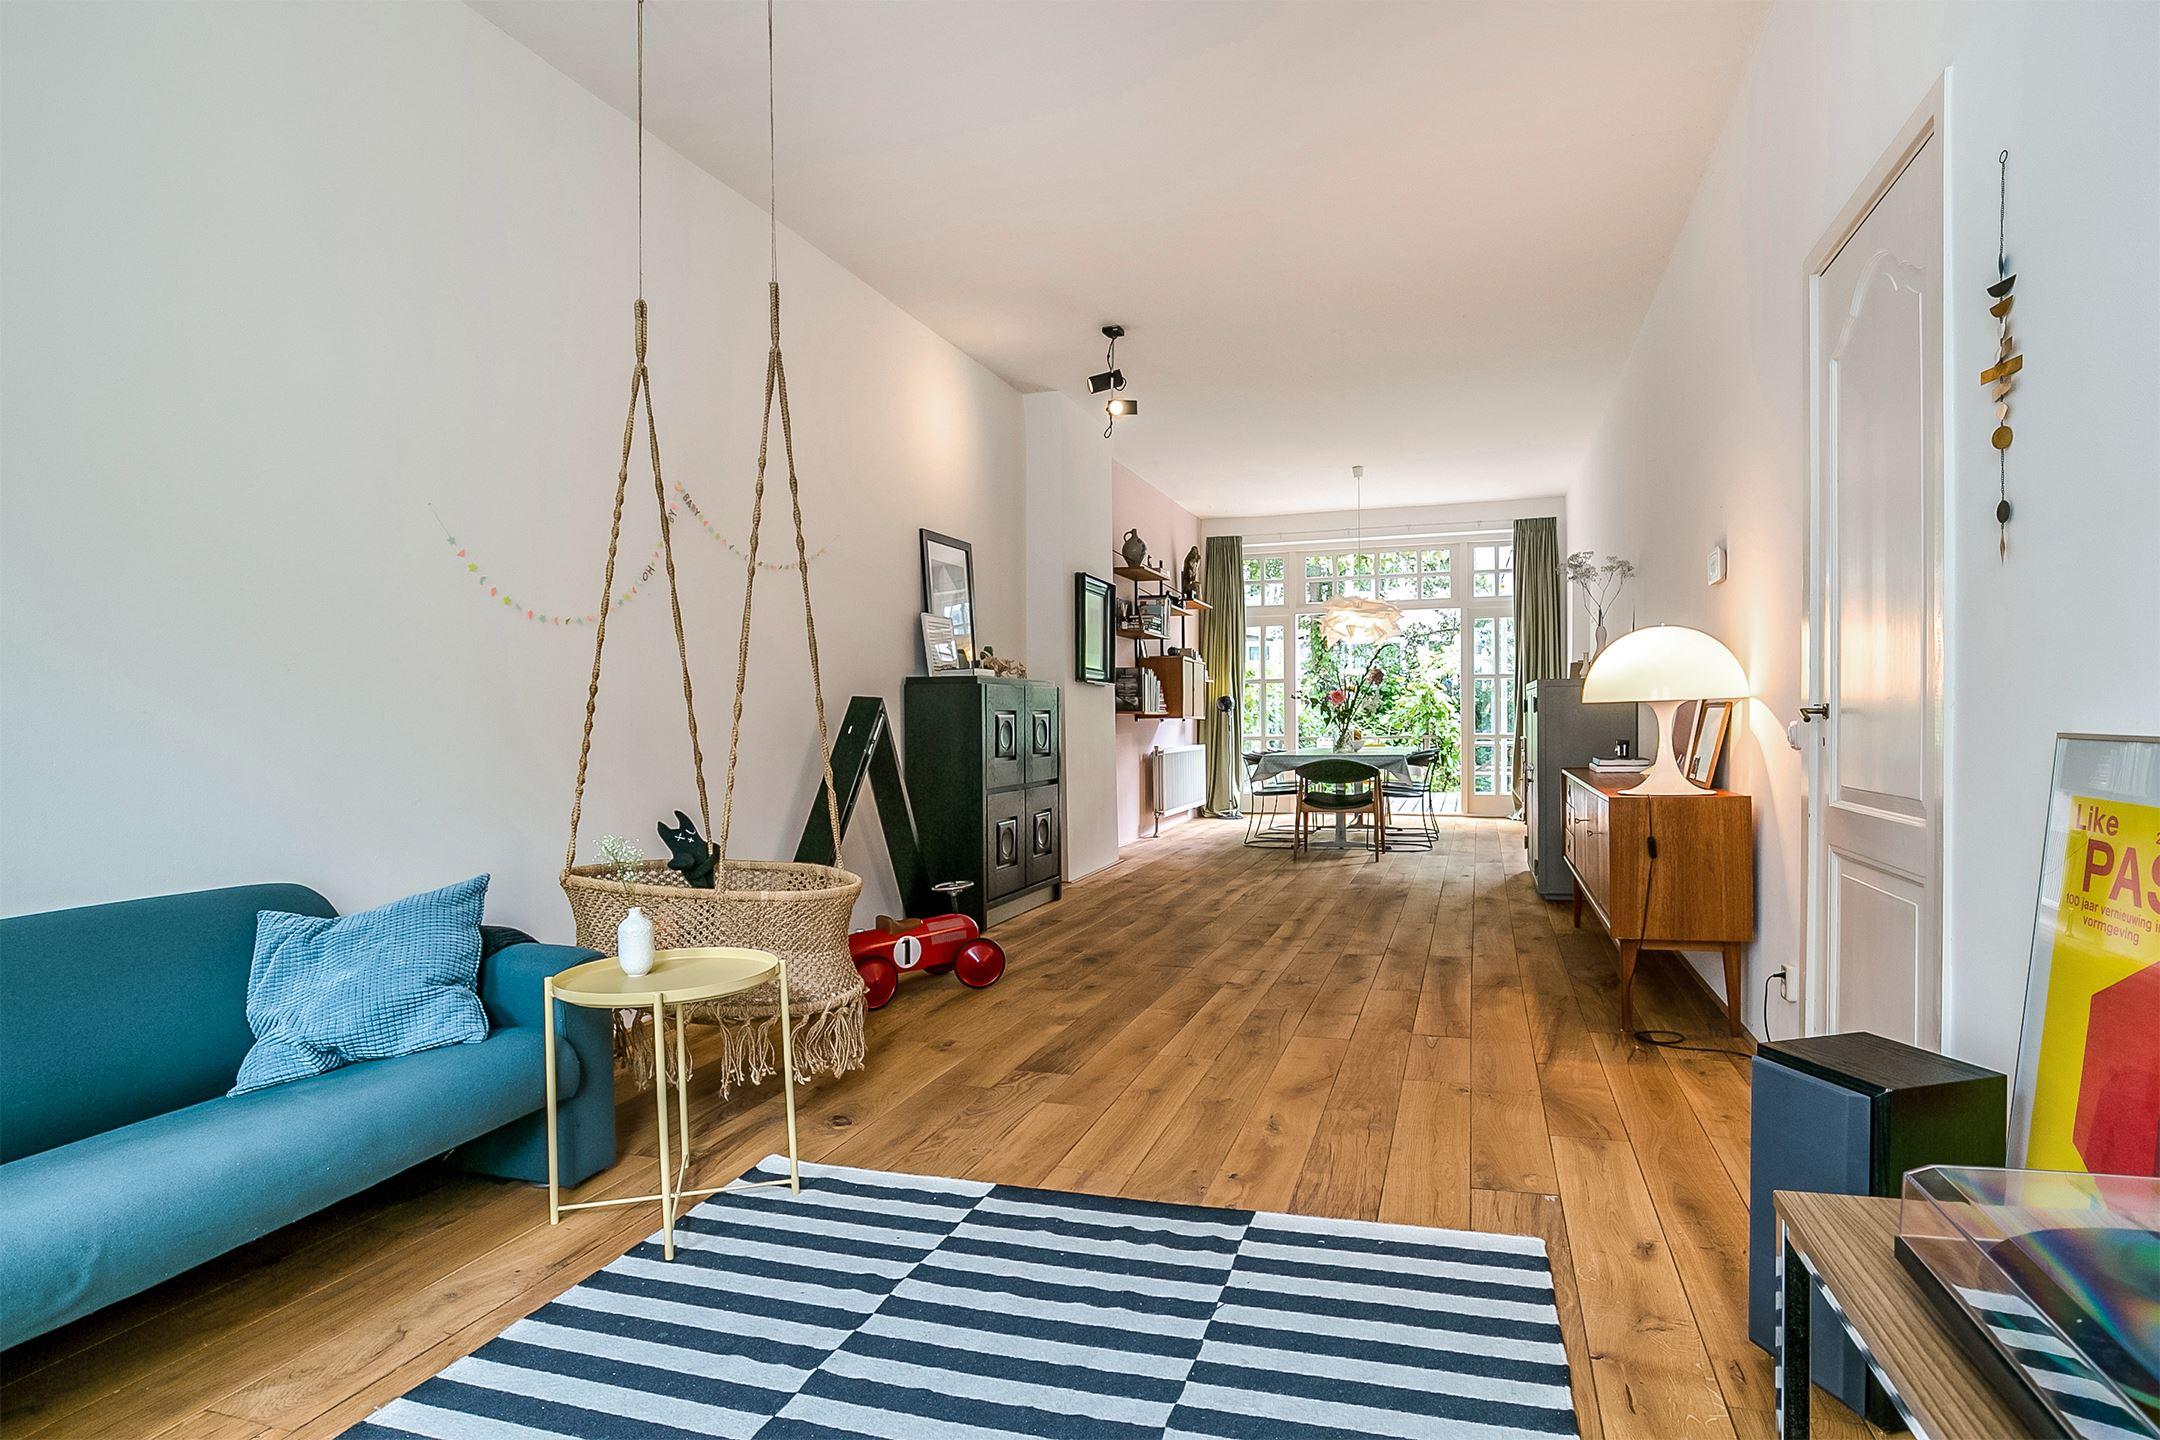 Hangmat Kopen Rotterdam.Verkocht Beukelsdijk 148 A 3022 Dm Rotterdam Funda